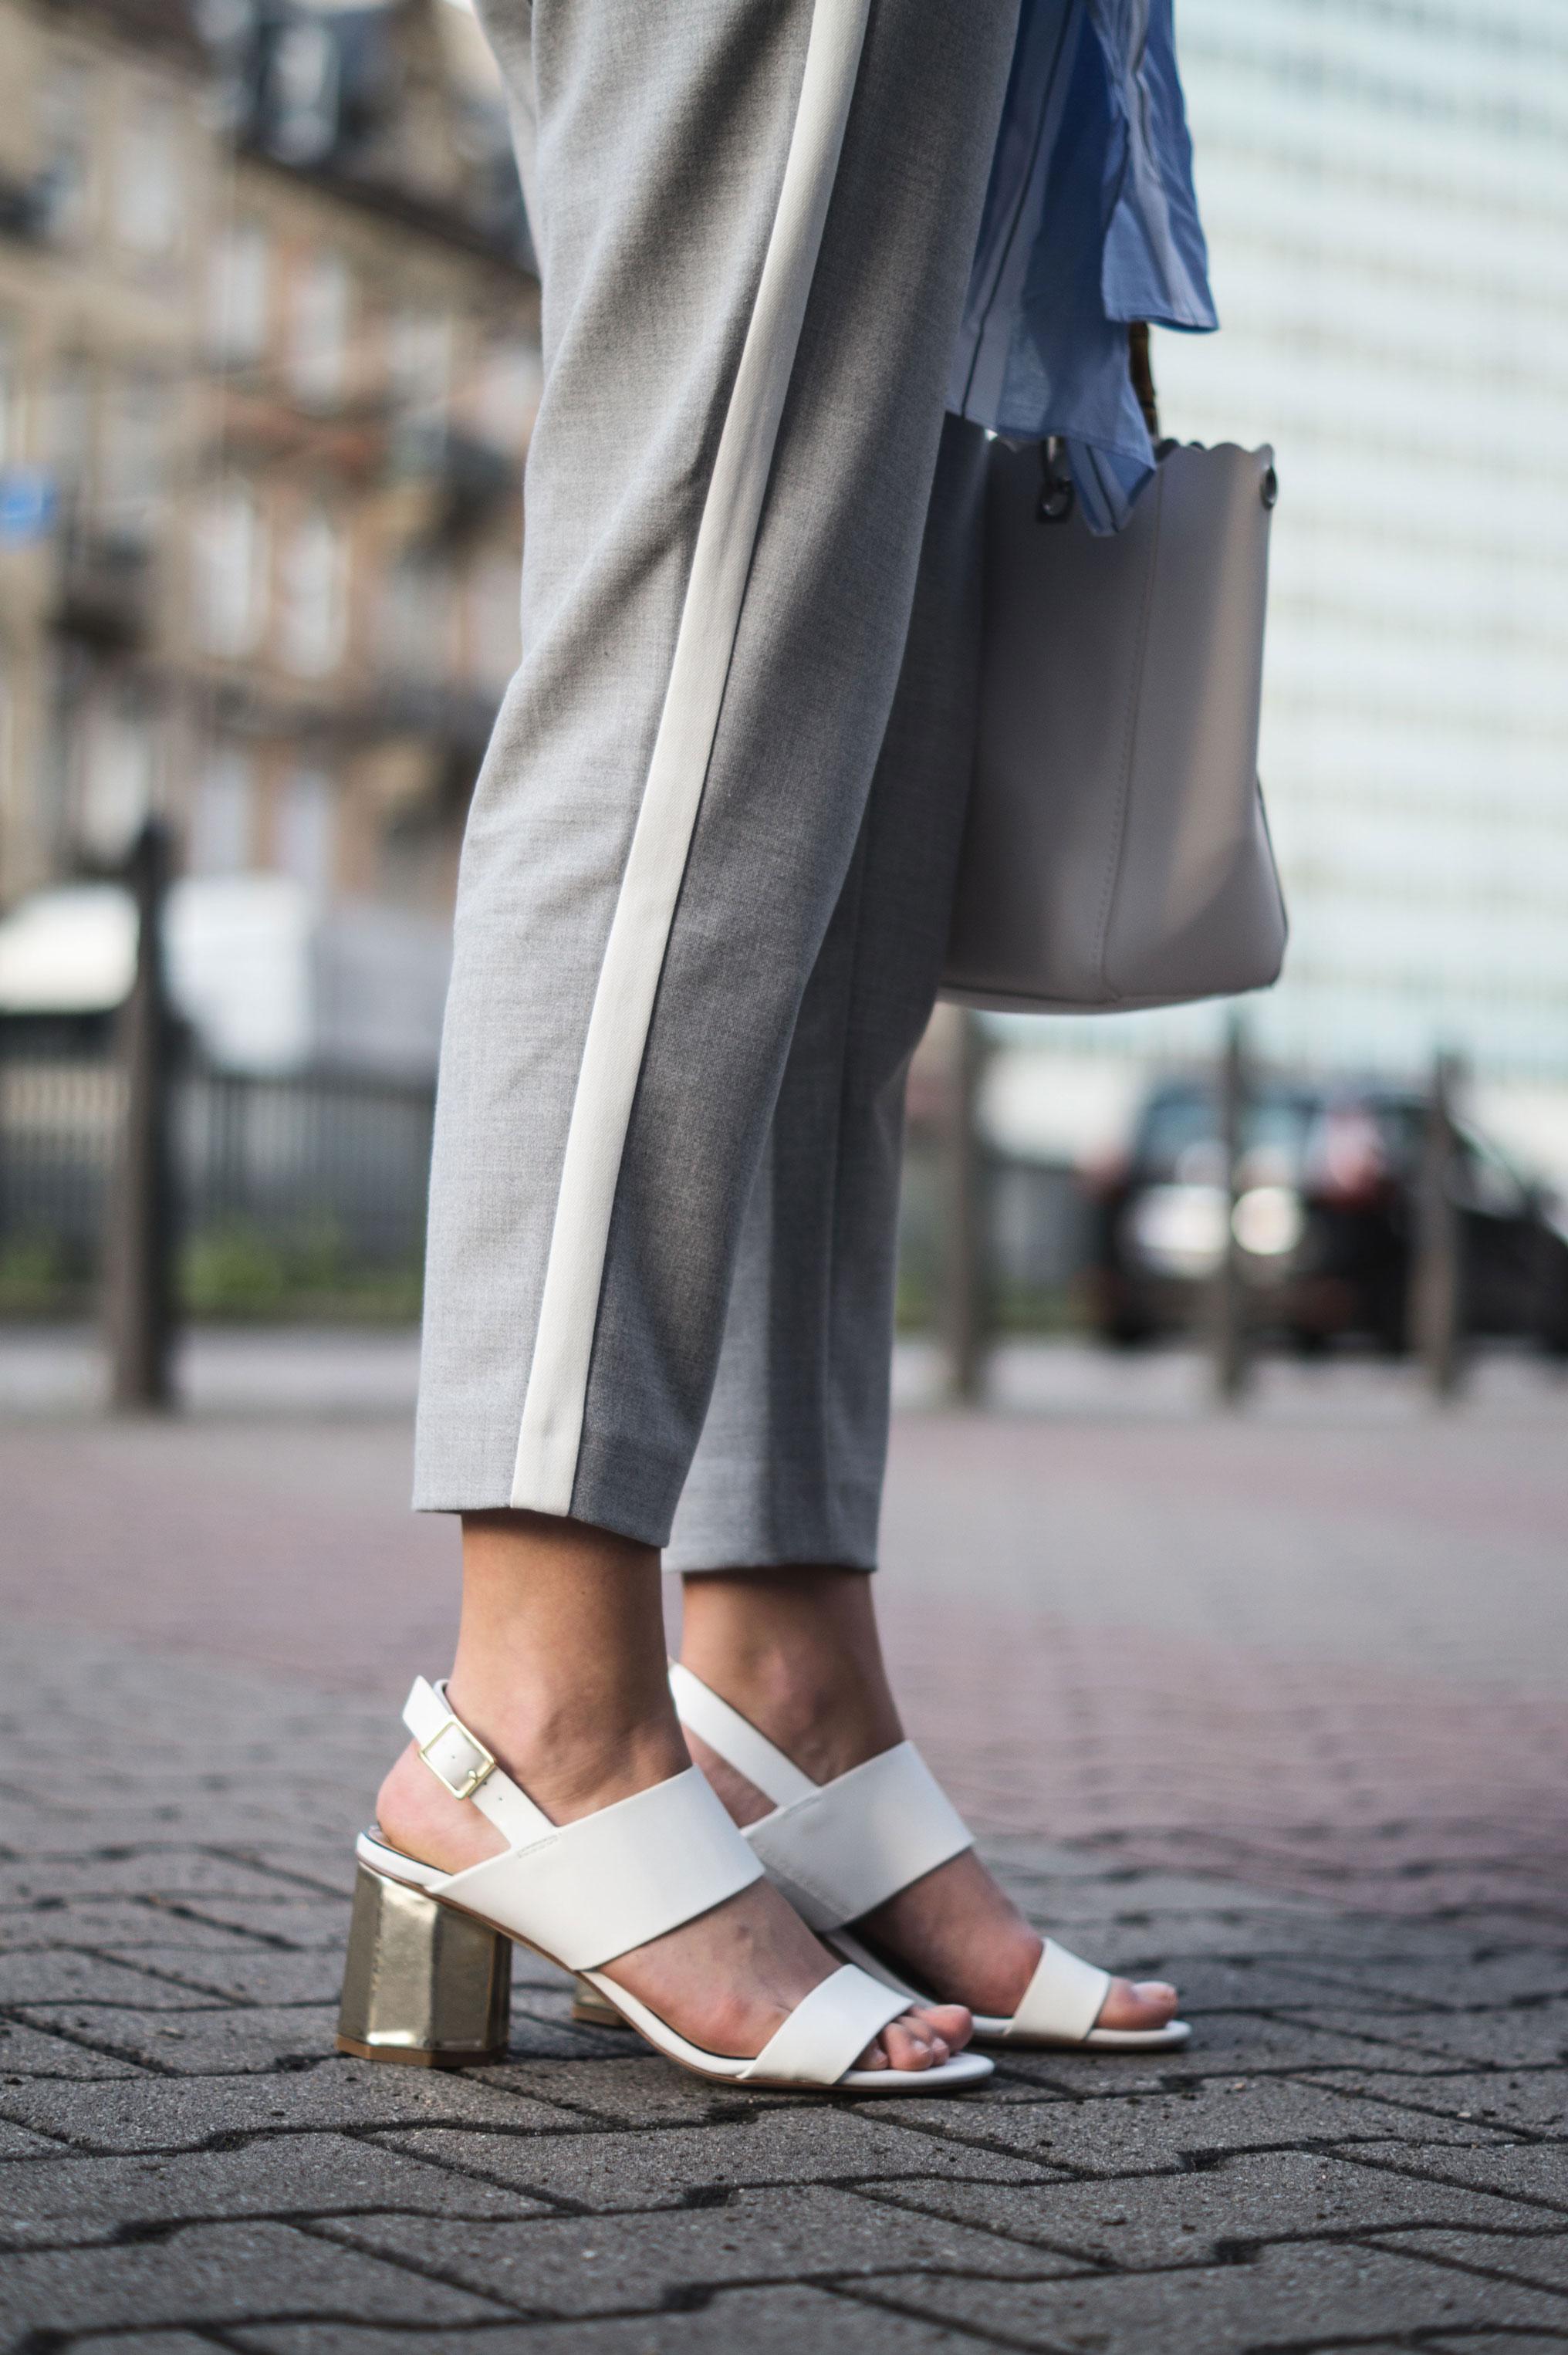 Mango-Wrap-Blouse-Knotenbluse-Joggers-Sariety-Fashionblogger-Modeblog-Heidelberg-Streetstyle-13